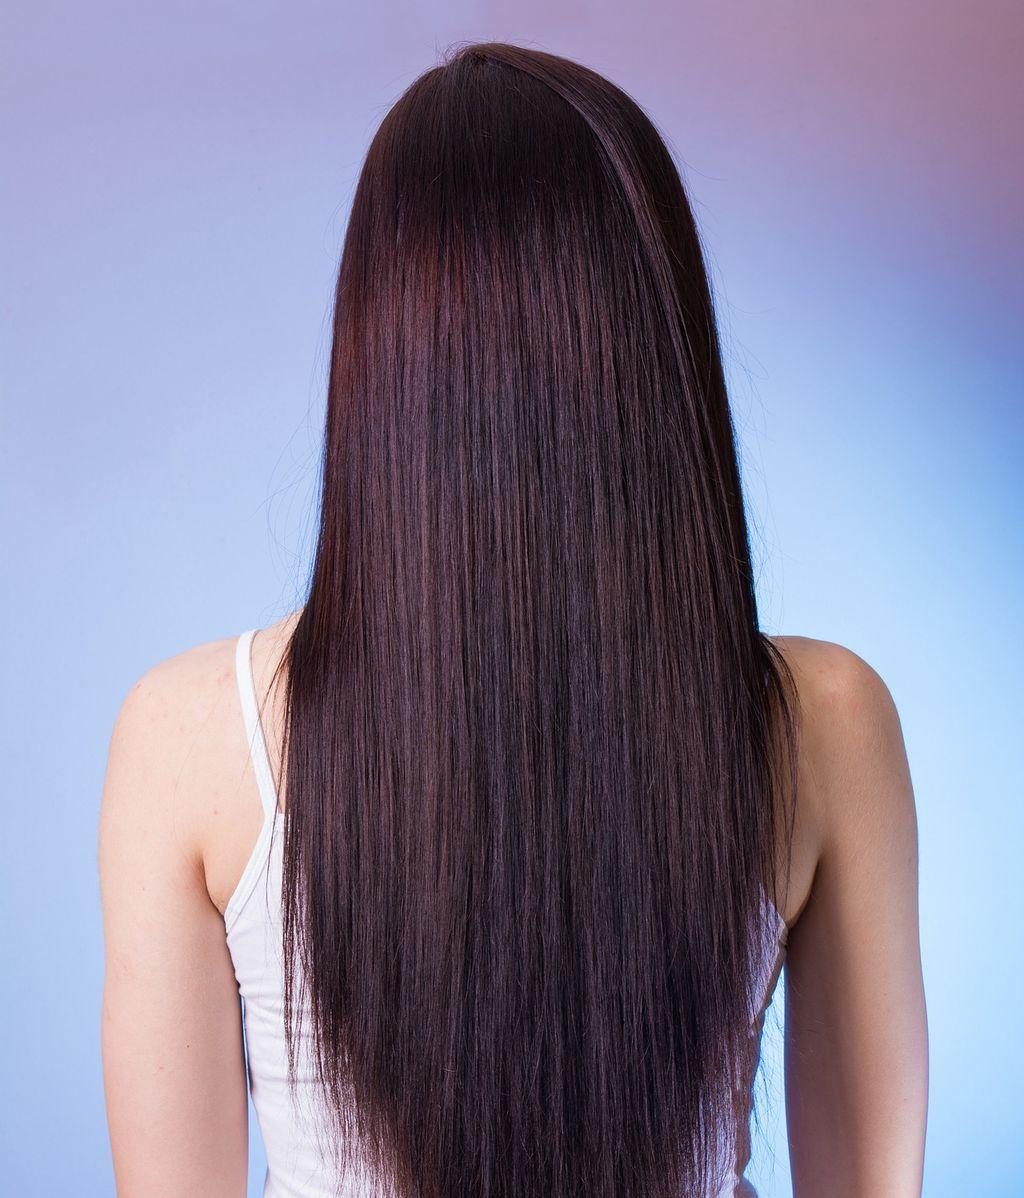 Enzimoterapia para alisar tu pelo